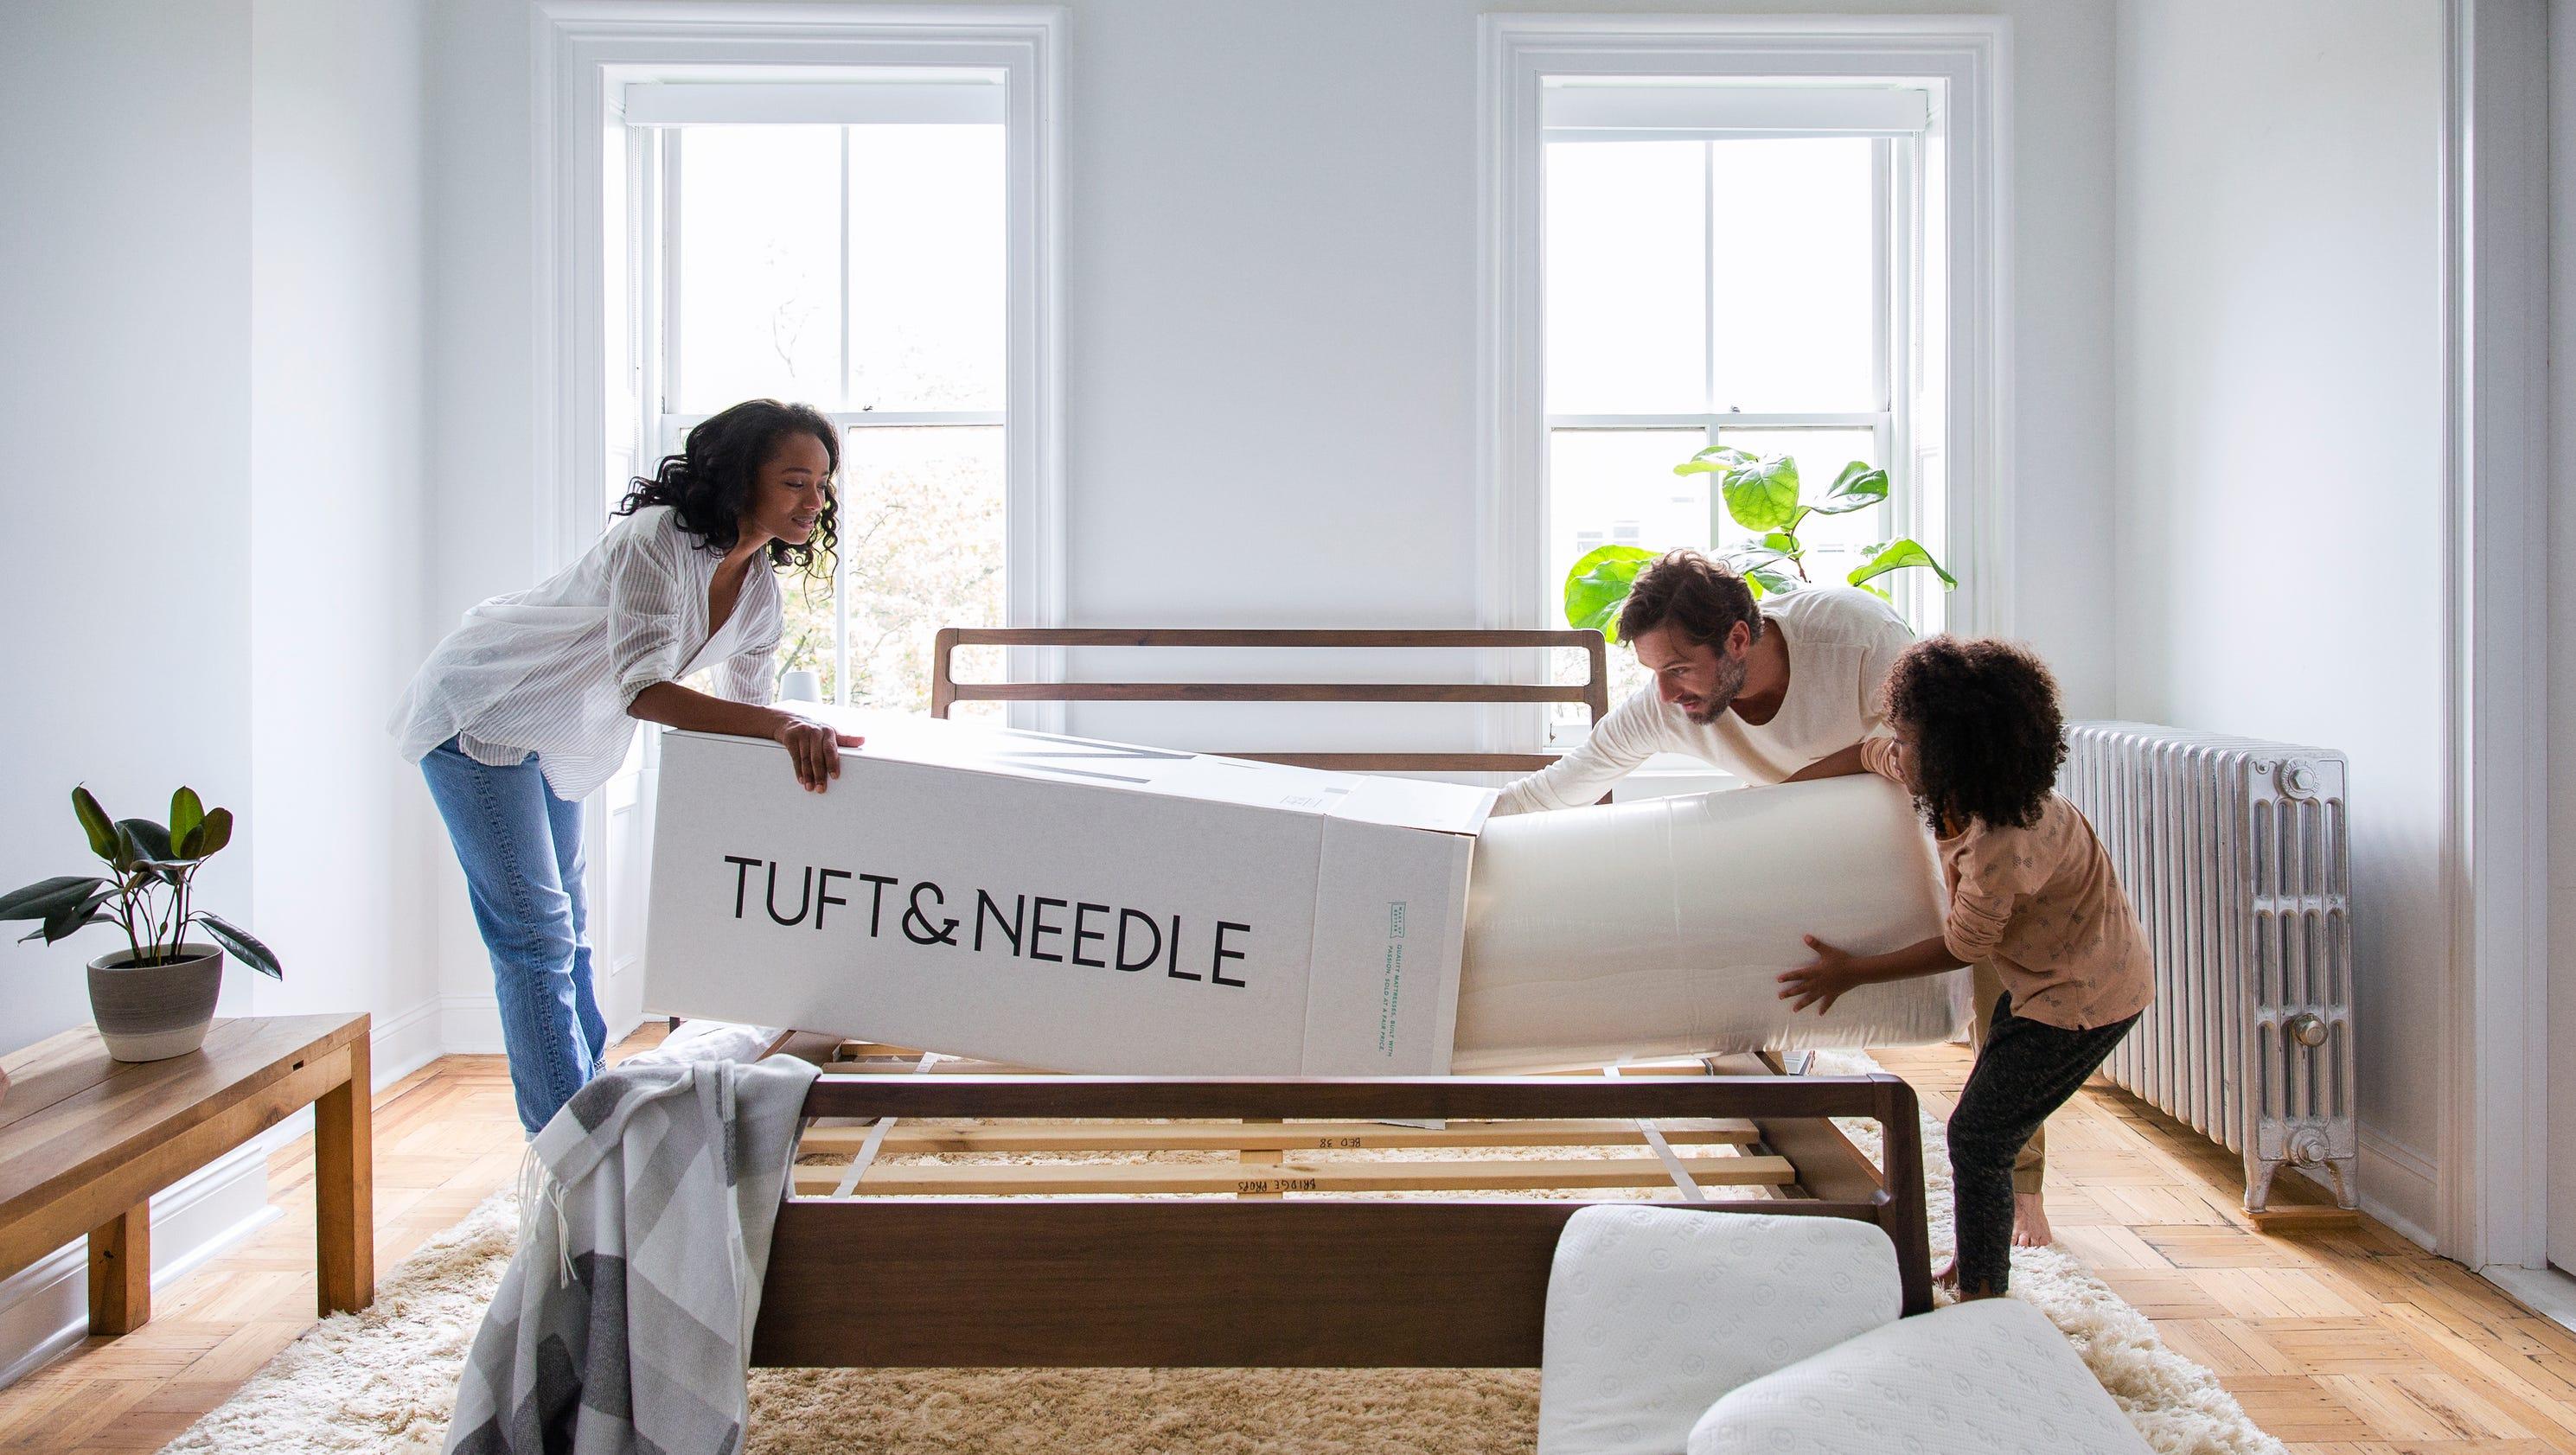 How to a new mattress